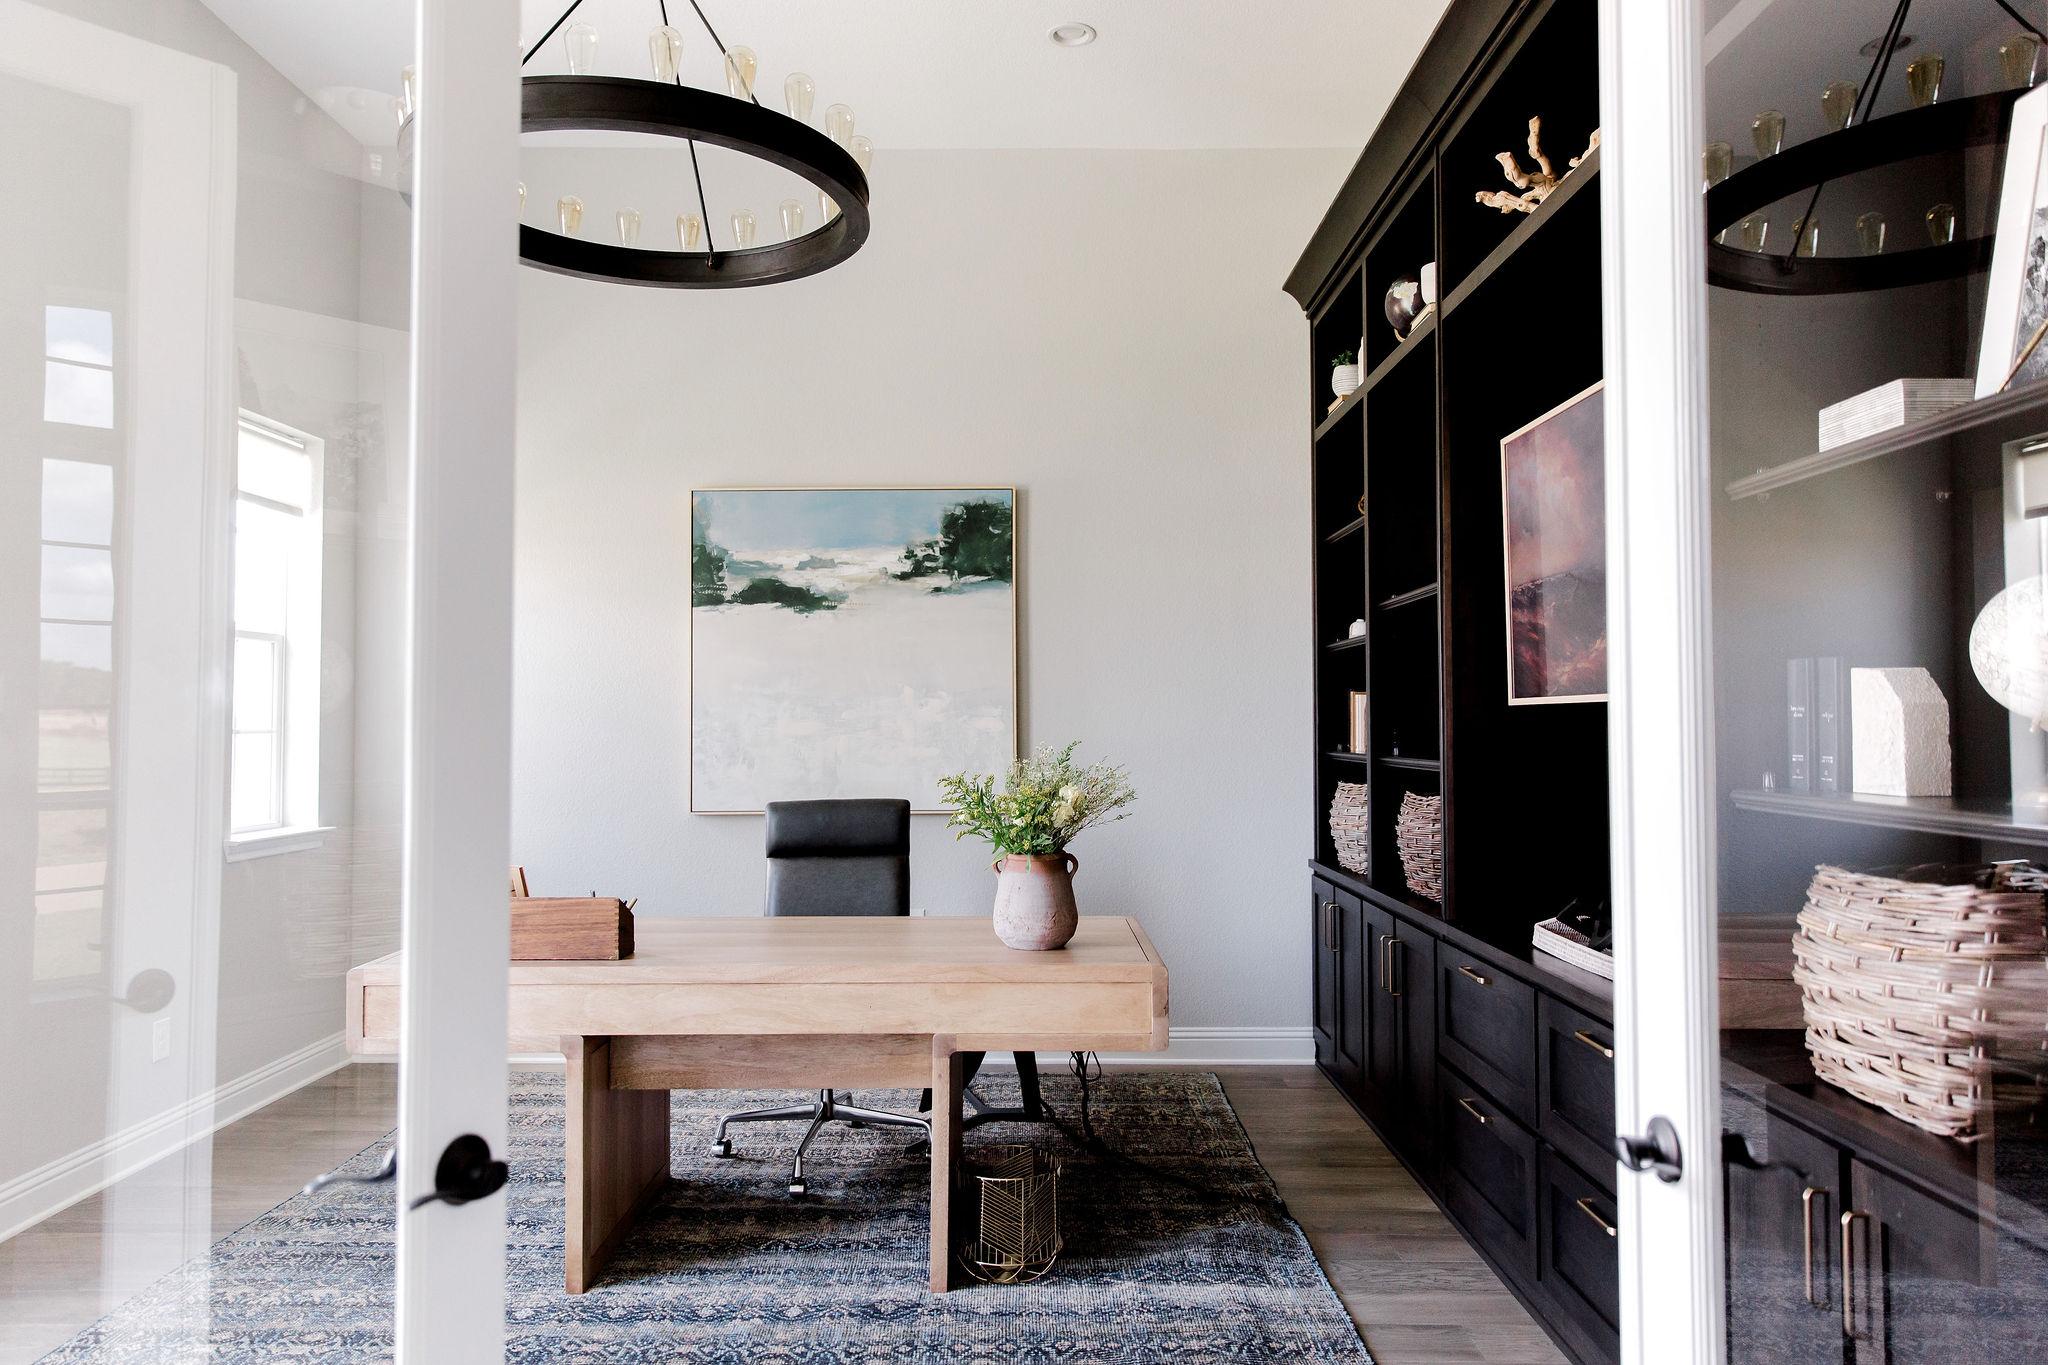 Office design by Laura Design and Co, Da